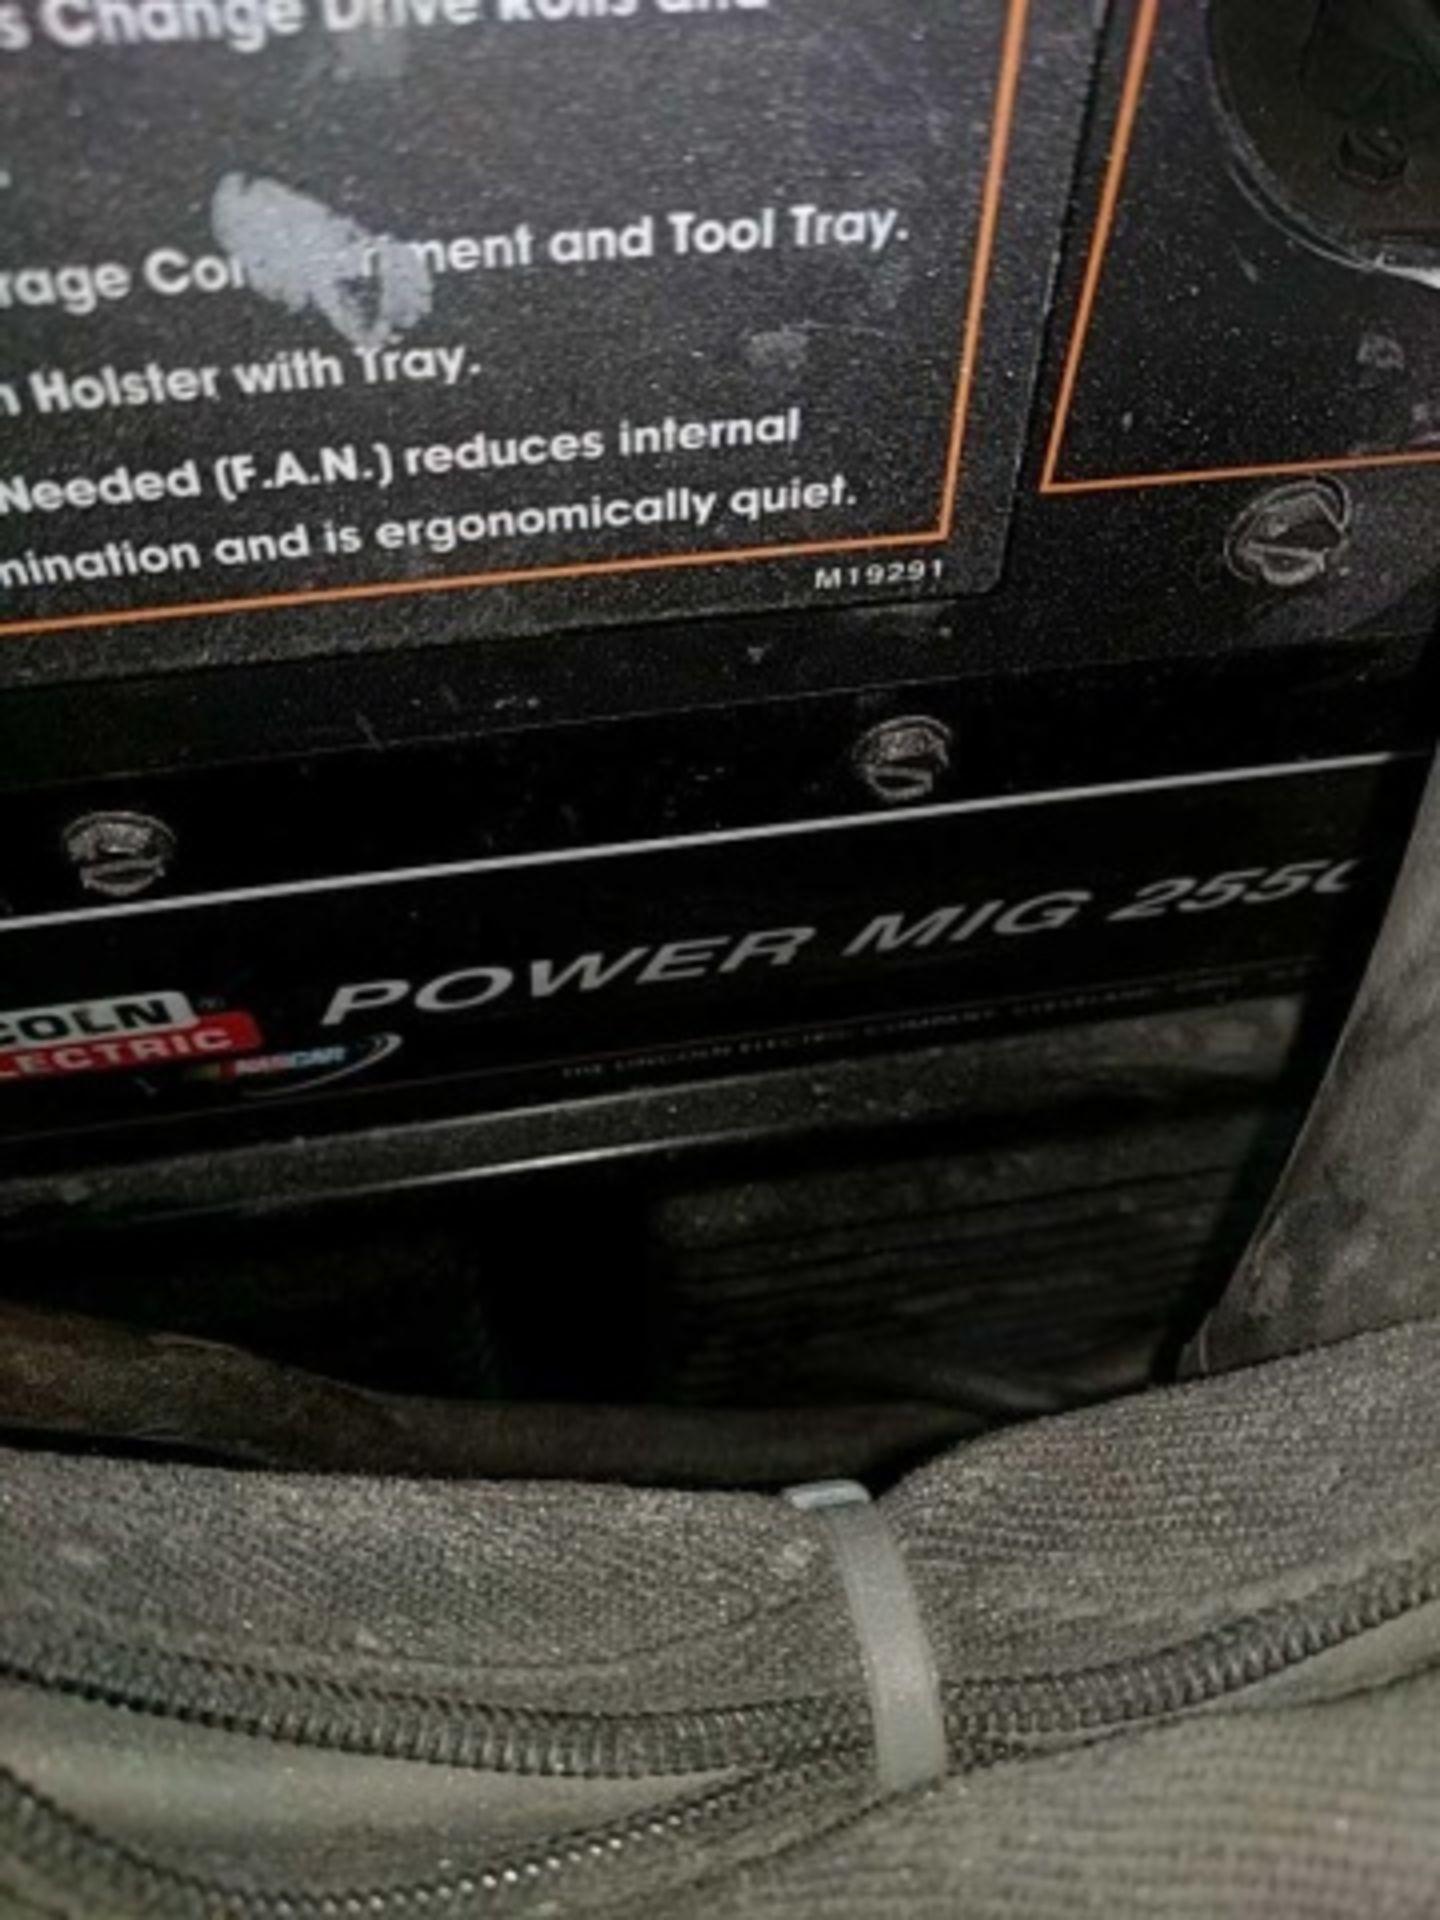 Lincoln Power Mig 255C Mig Welder - Image 2 of 4